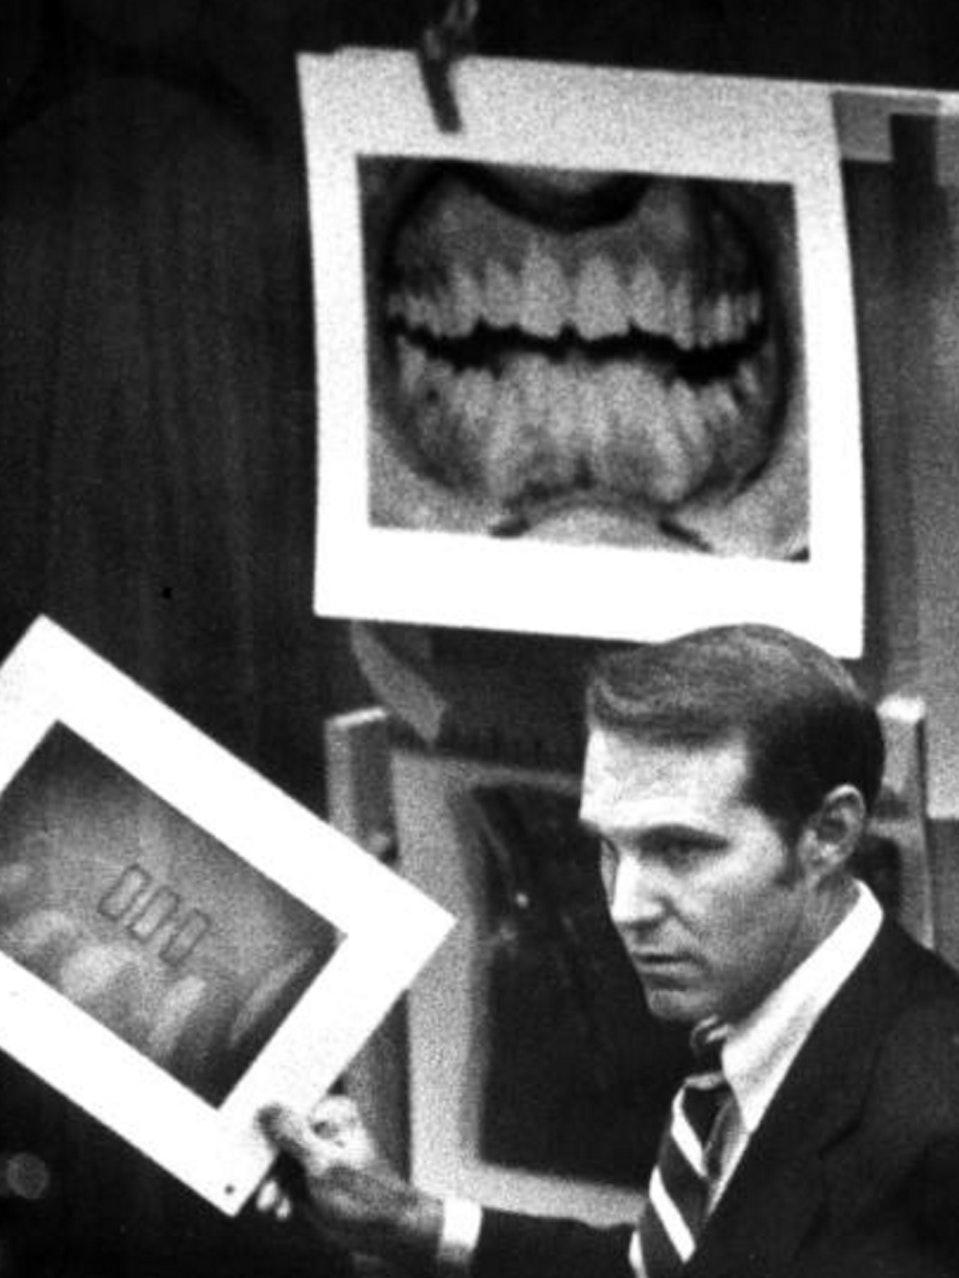 Dental evidence used against Ted Bundy.